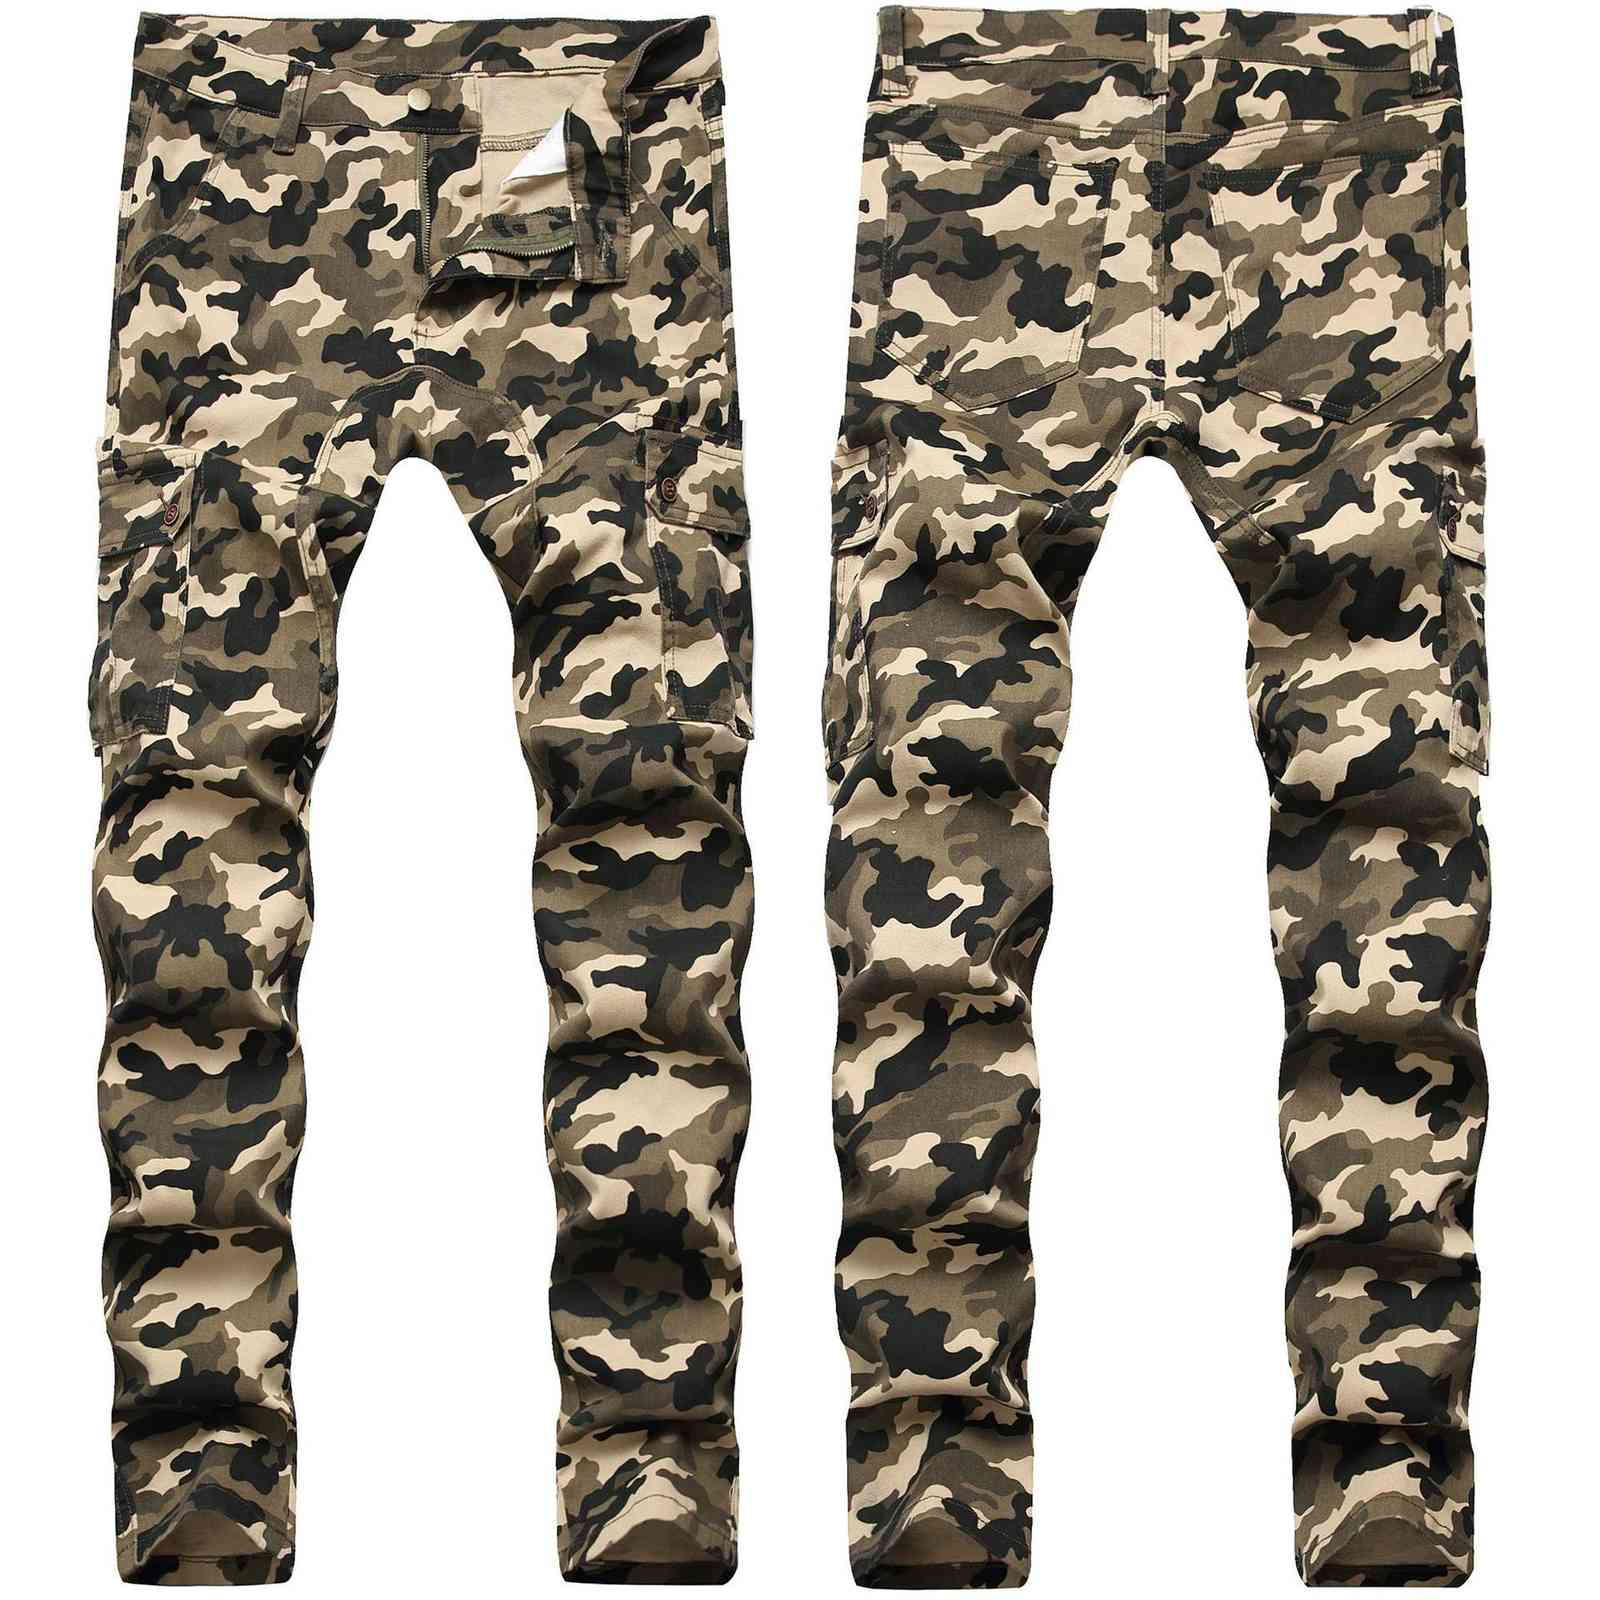 ny Mens Camo Jeans Cool Men Jeans Stretch Slim Fit Denim Biker Jeans Hip Hop Men Streetwear 755#